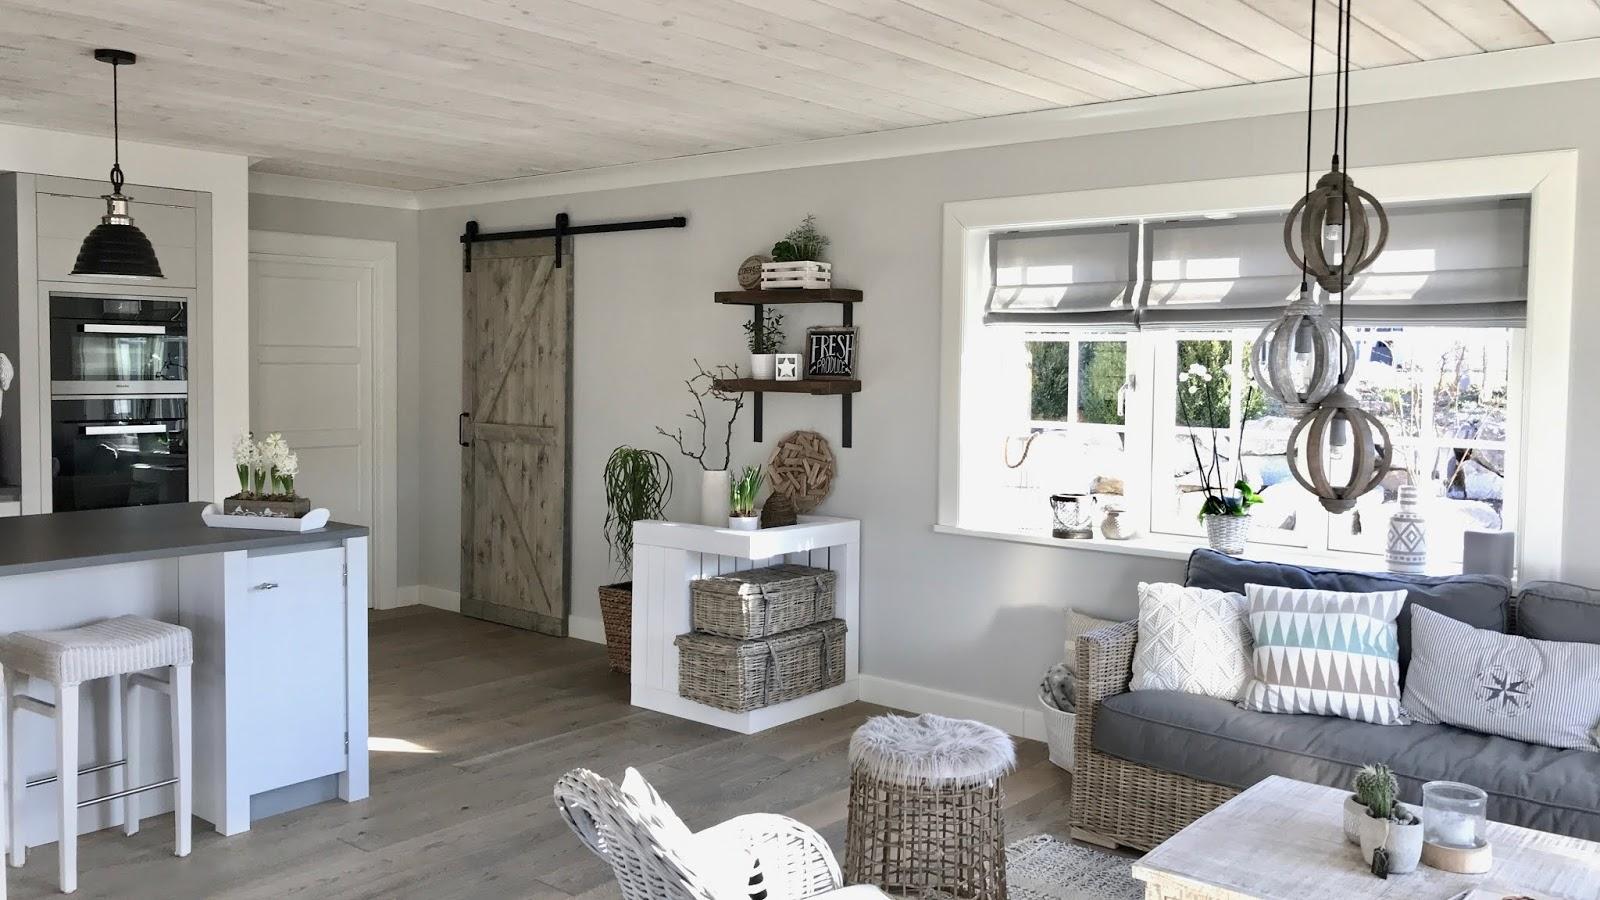 Der Farmhouse Stil - ein Trend aus Amerika! - Beachhouse Living